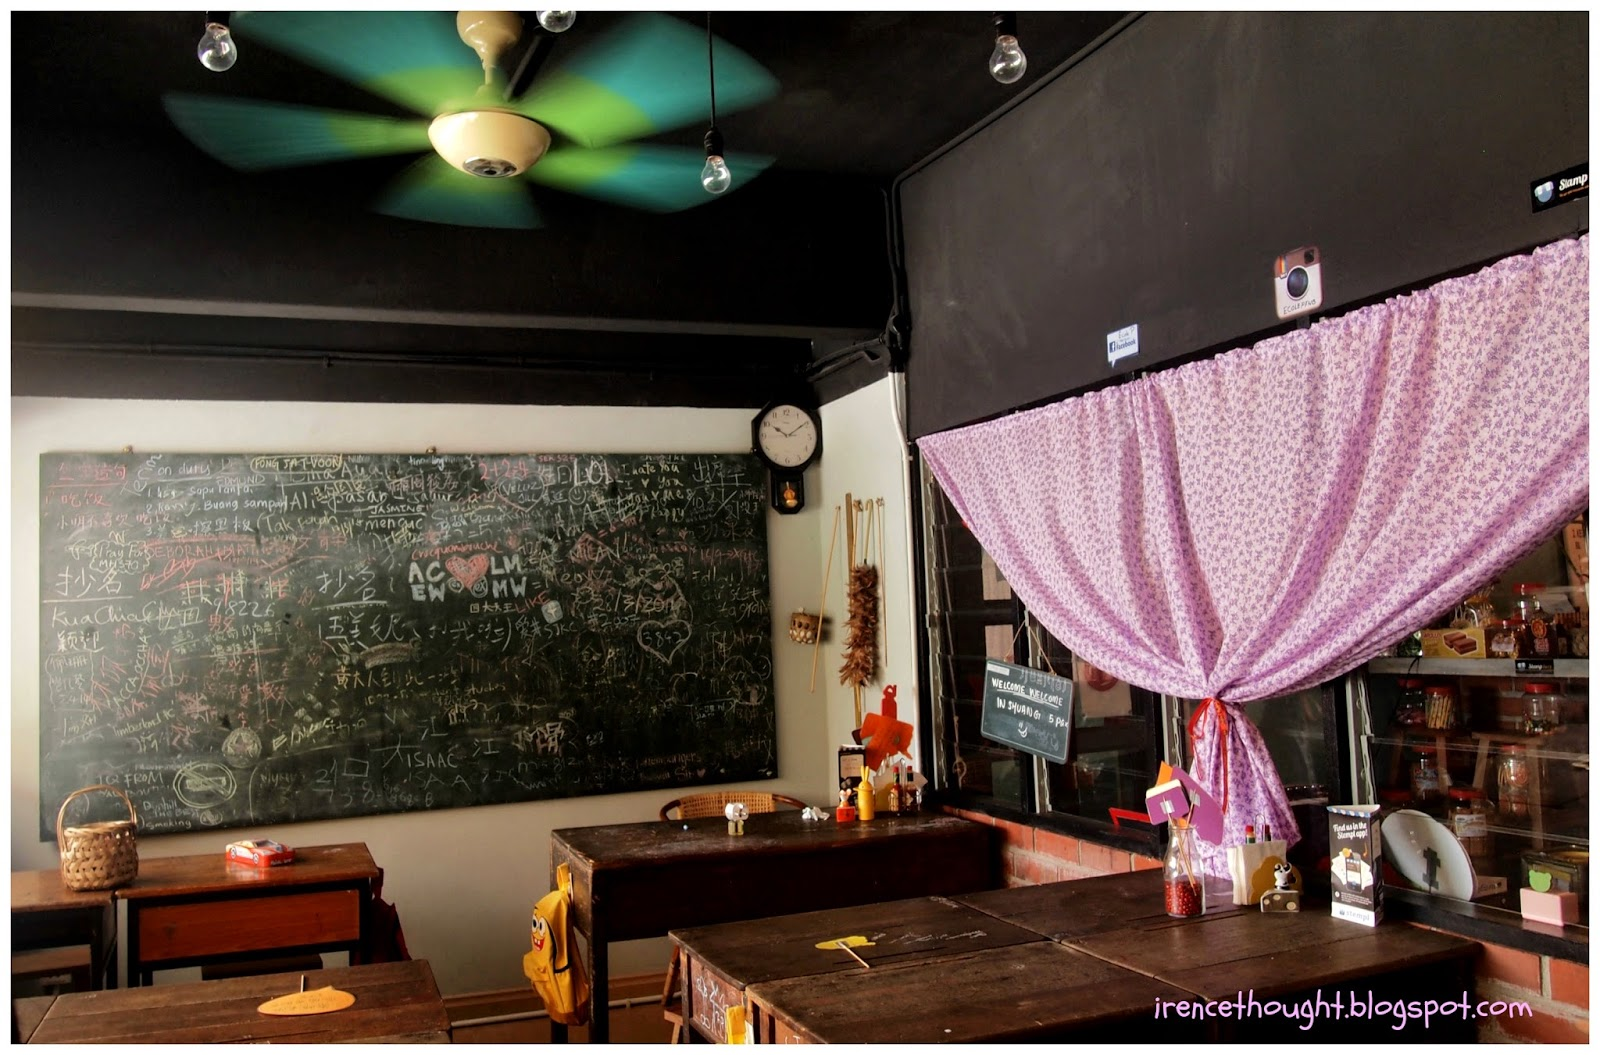 Classroom inside a cafe